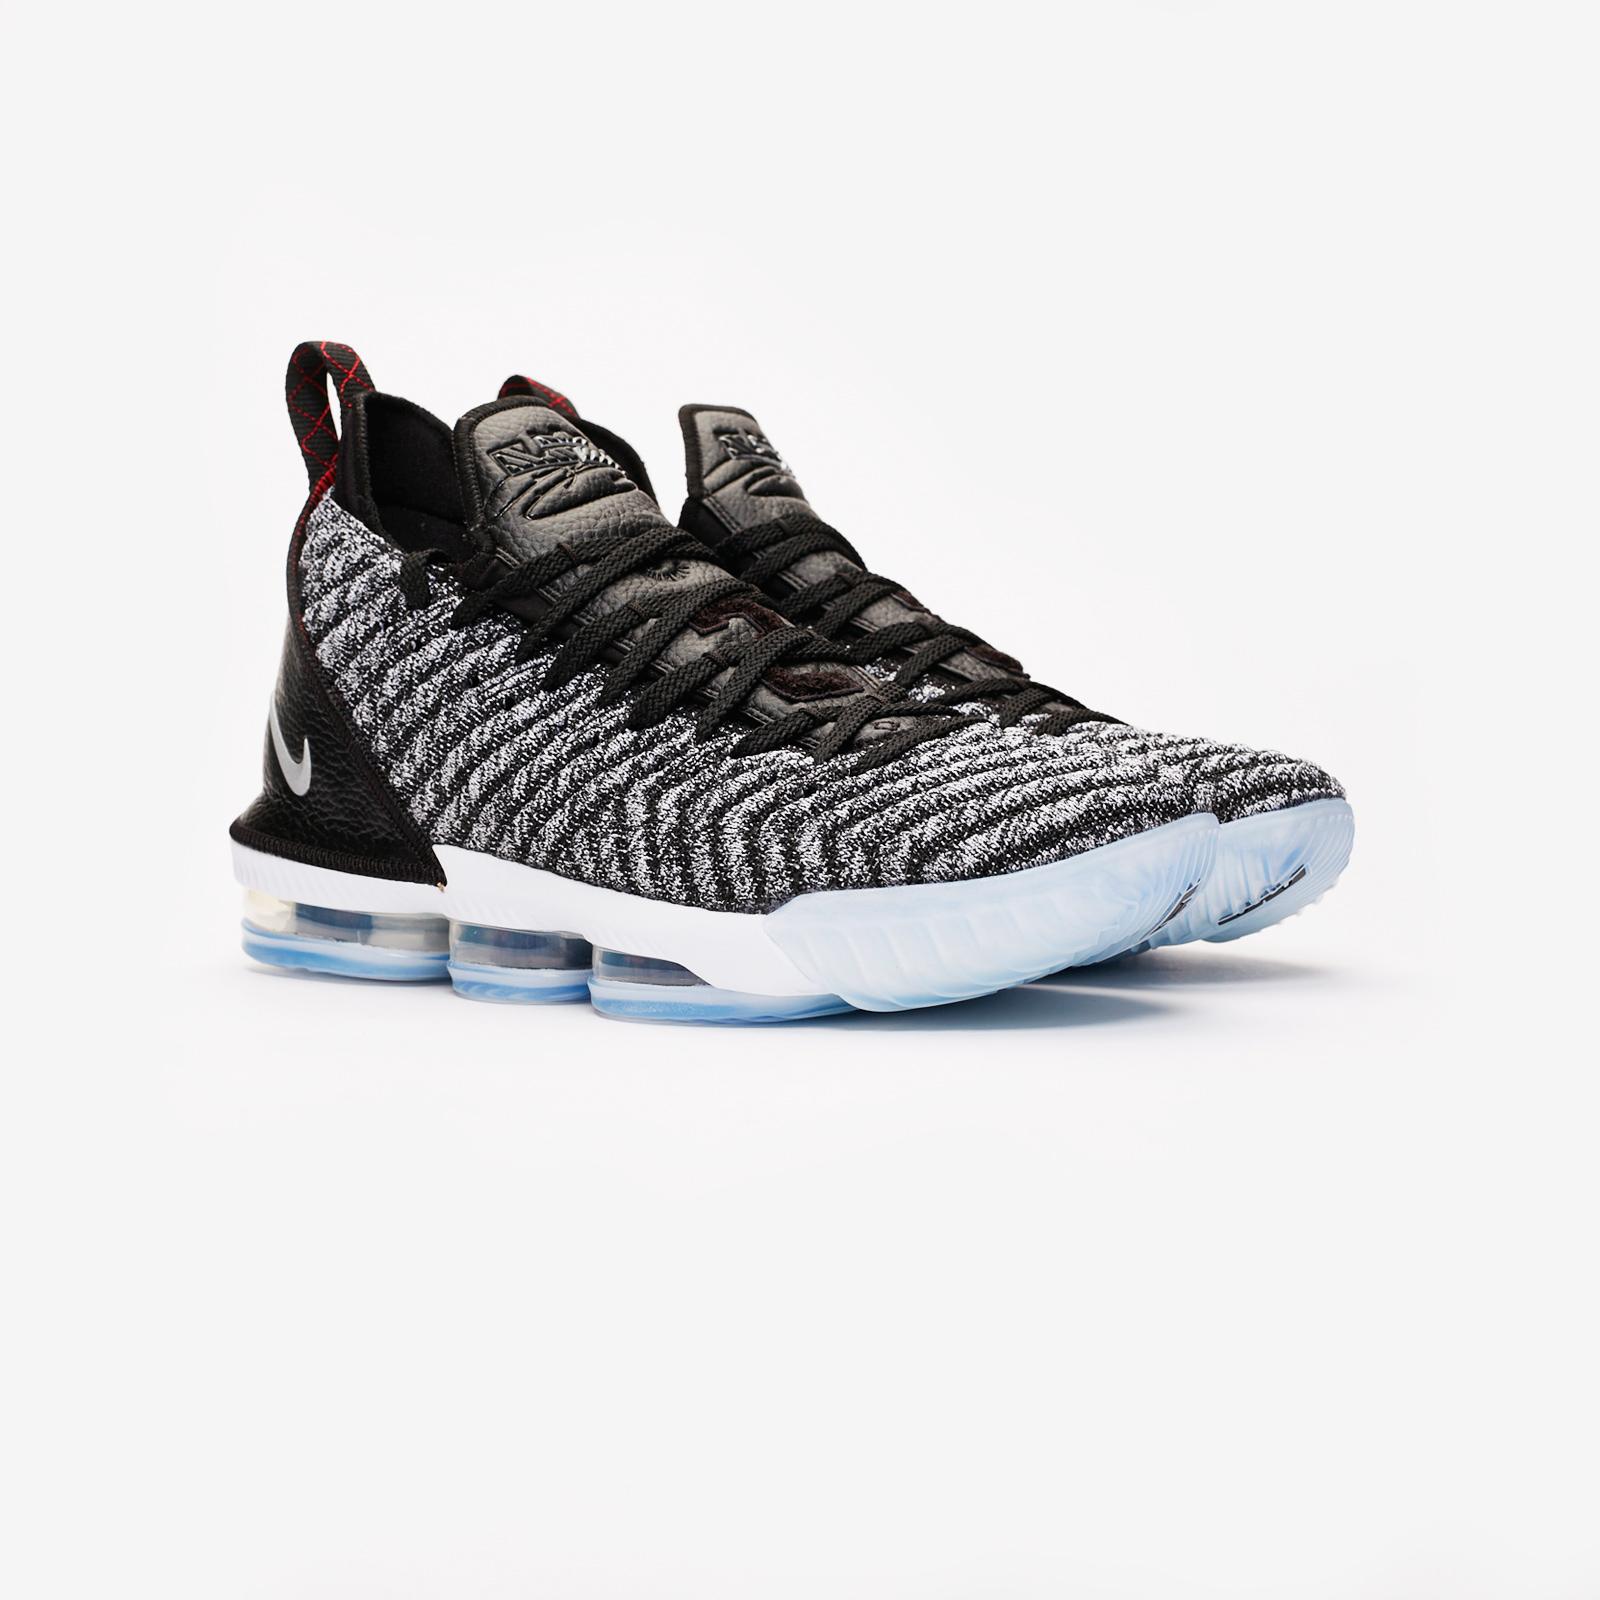 separation shoes 6aaf3 c1c07 Nike Basketball LeBron XVI